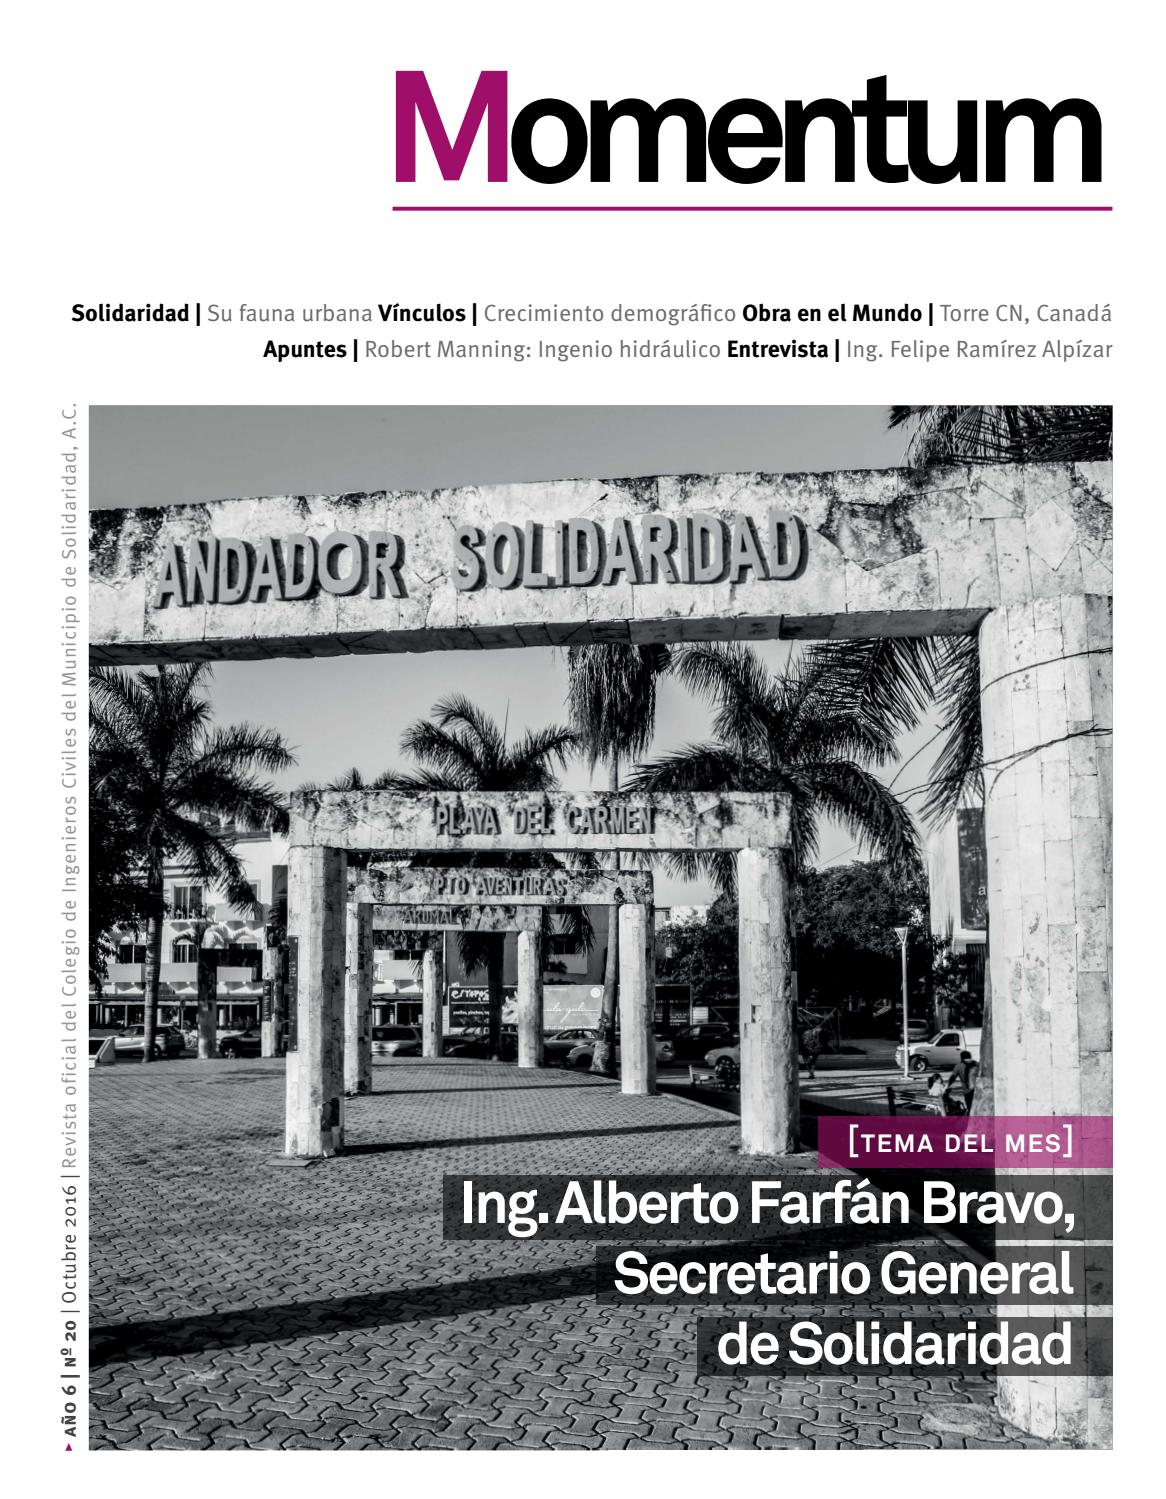 Momentum no.20 Octubre 2016 by Revista Momentum - issuu